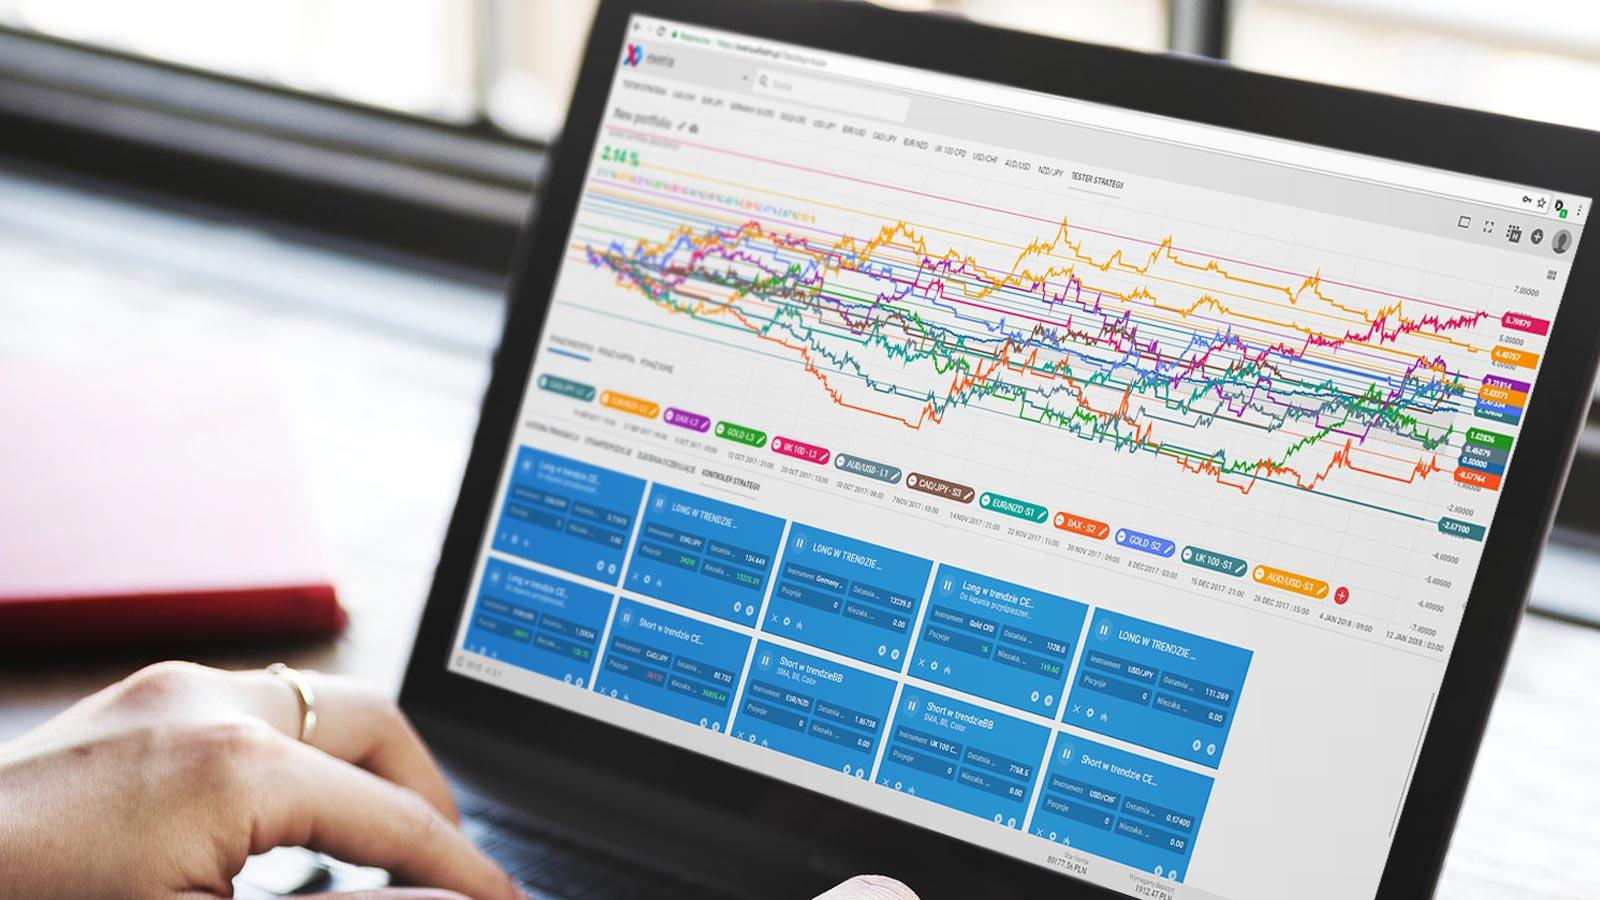 rachunek inwestycyjny, investment account, trading platform, robot